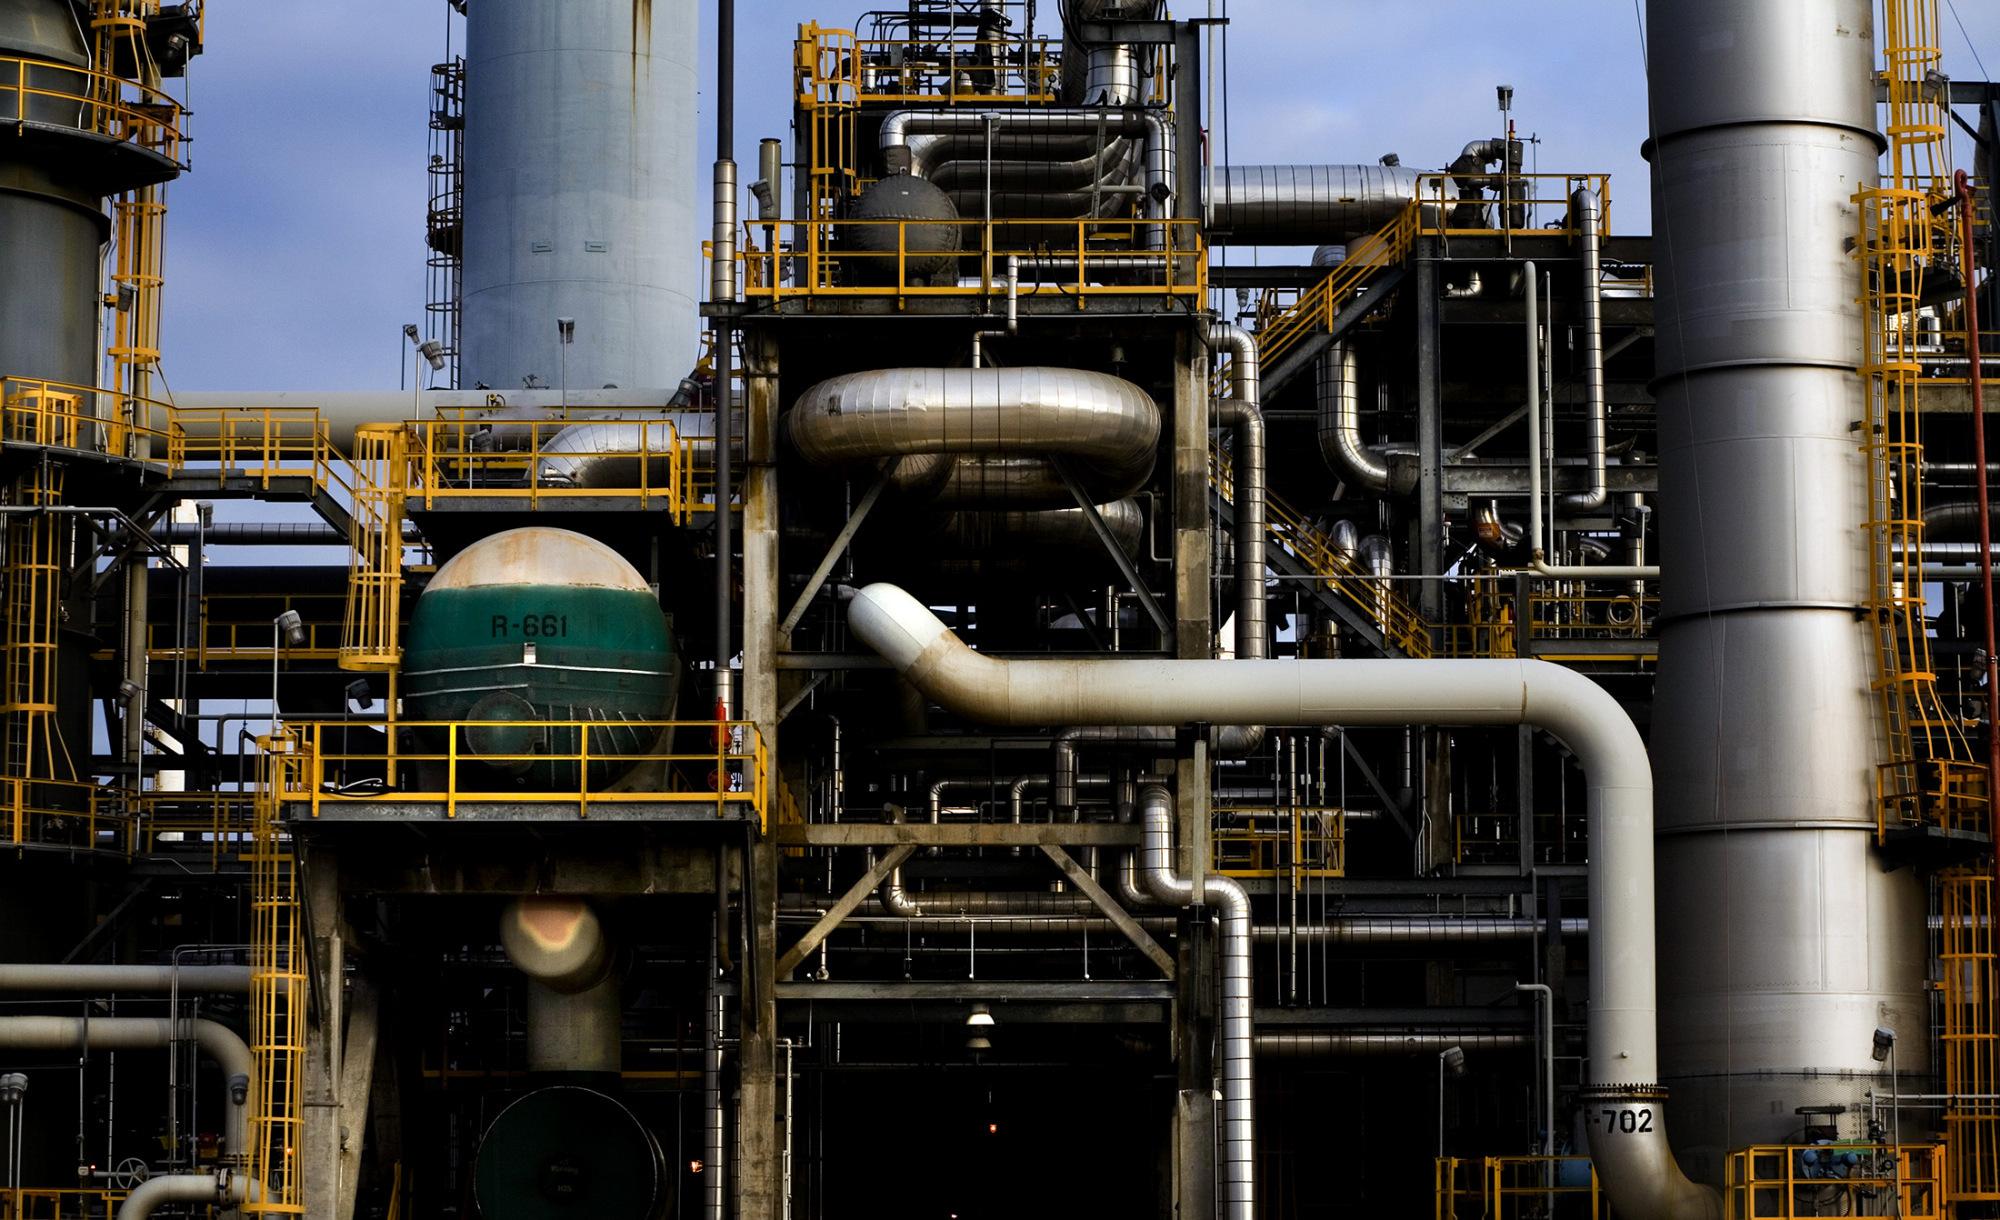 Exxon Posts Smallest Profit Since 1999 Amid Global Oil Slump